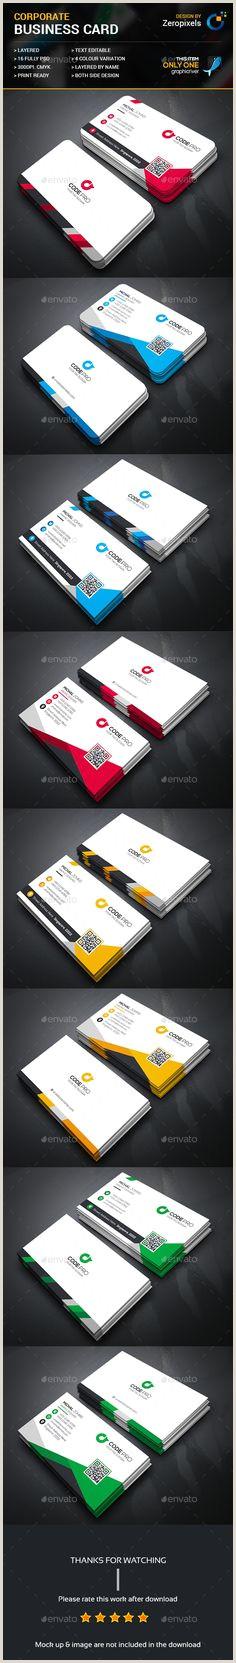 Best Business Cards To Churn 10 Best Car Design Images